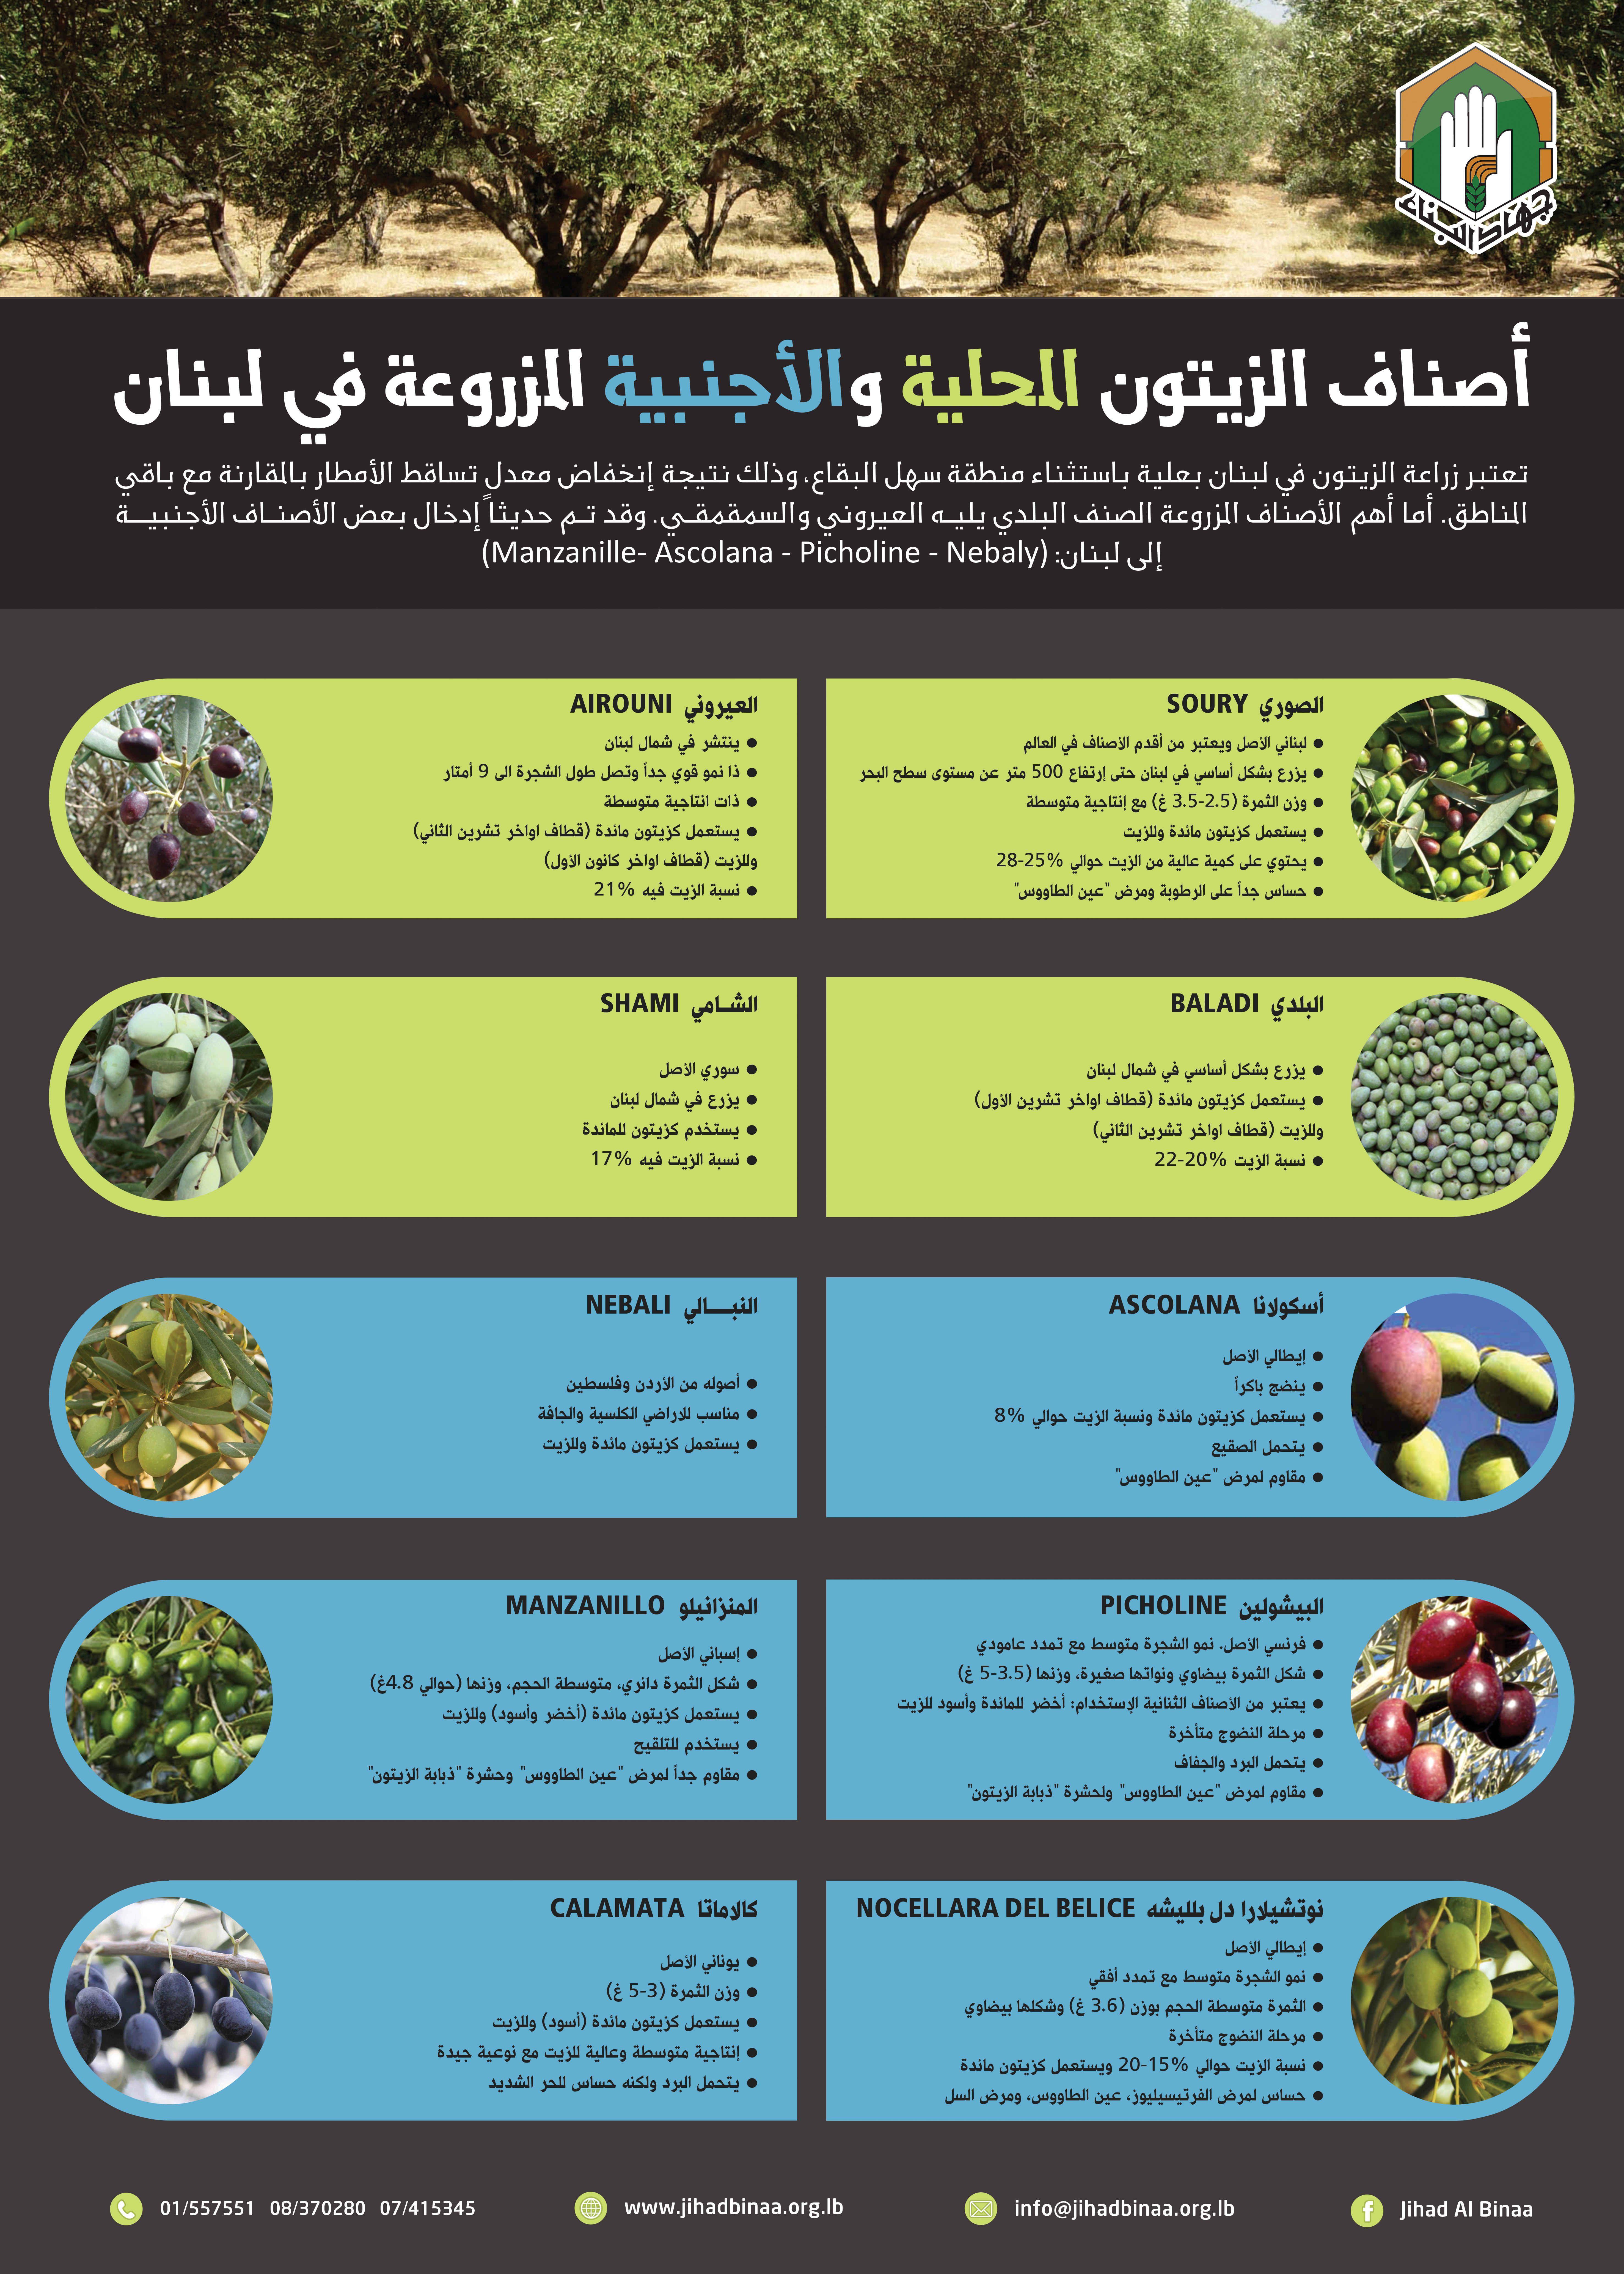 أصناف الزيتون في لبنان Tree Farms Agriculture Plants